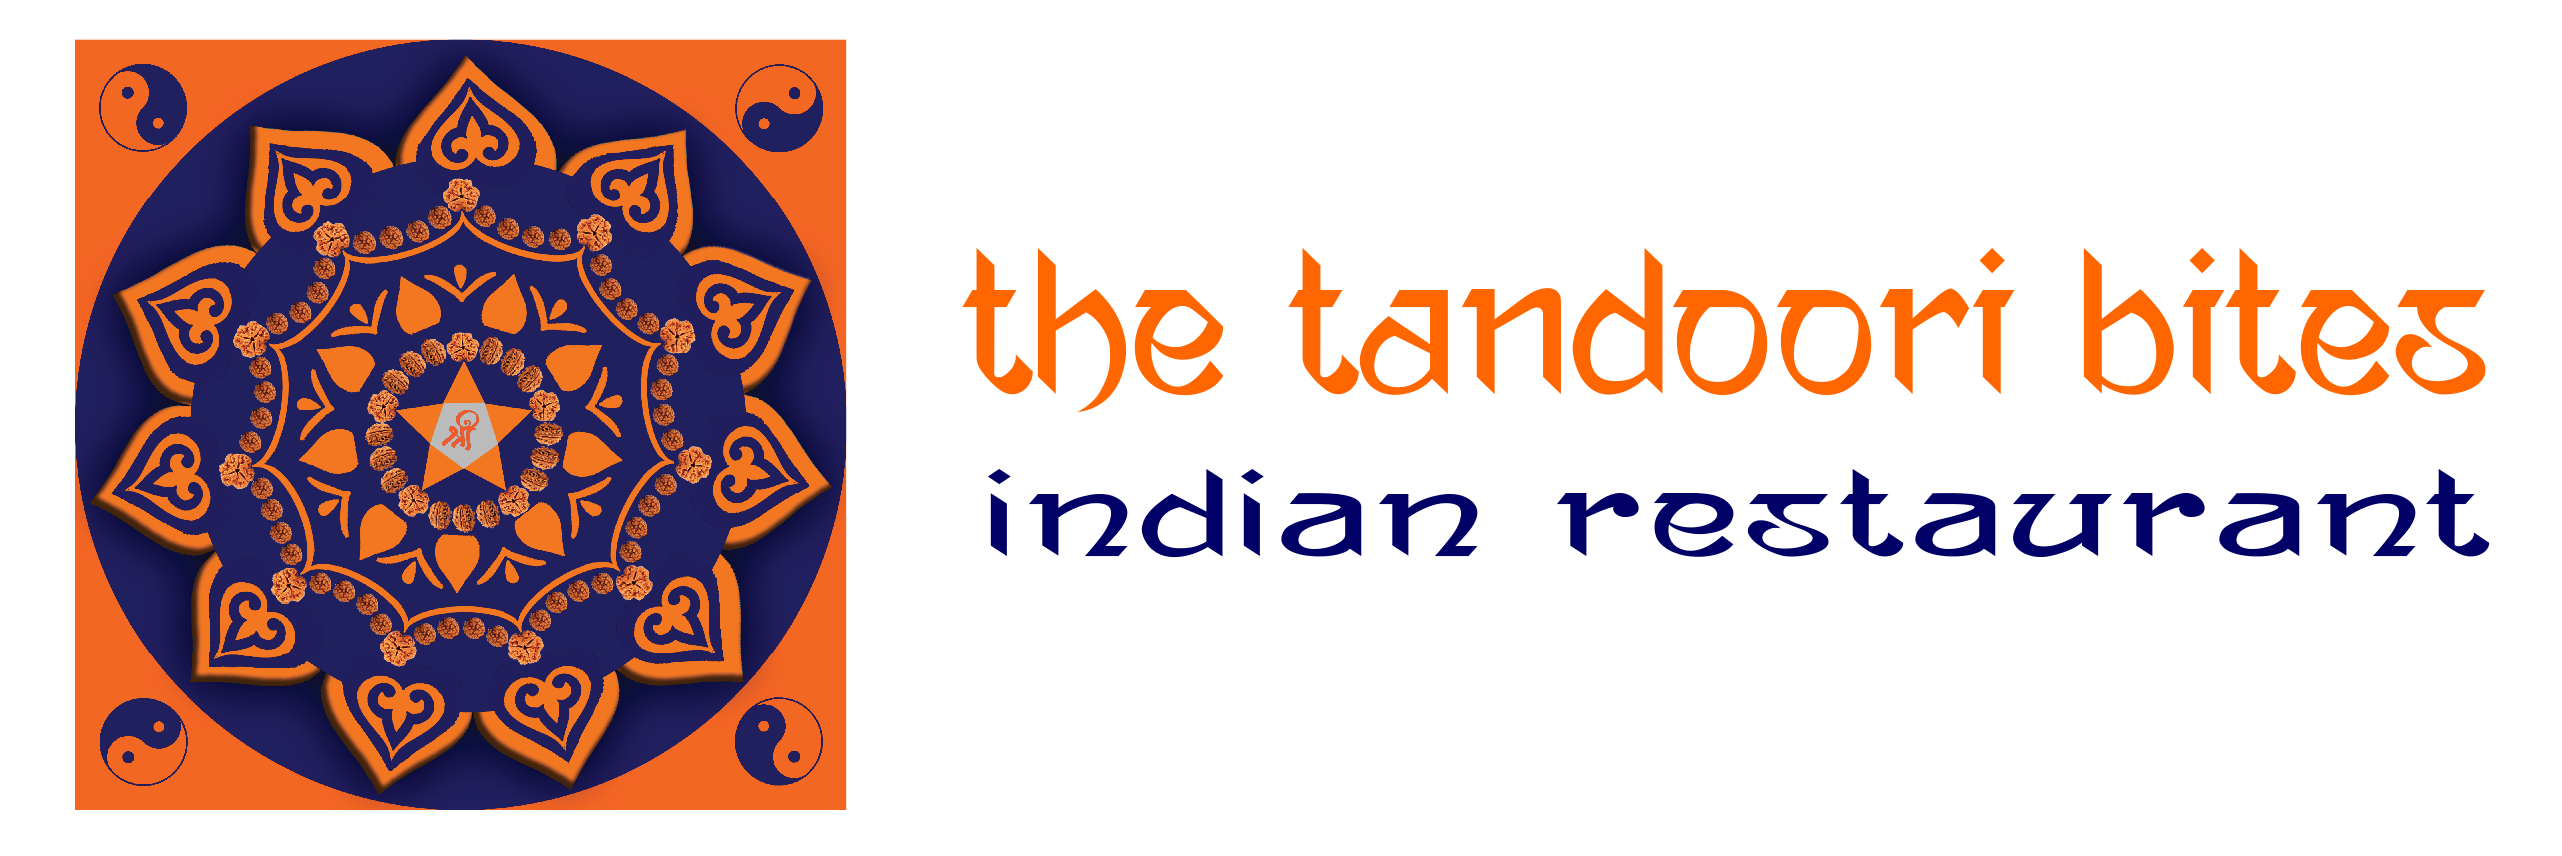 logo_tandoori_bites-min